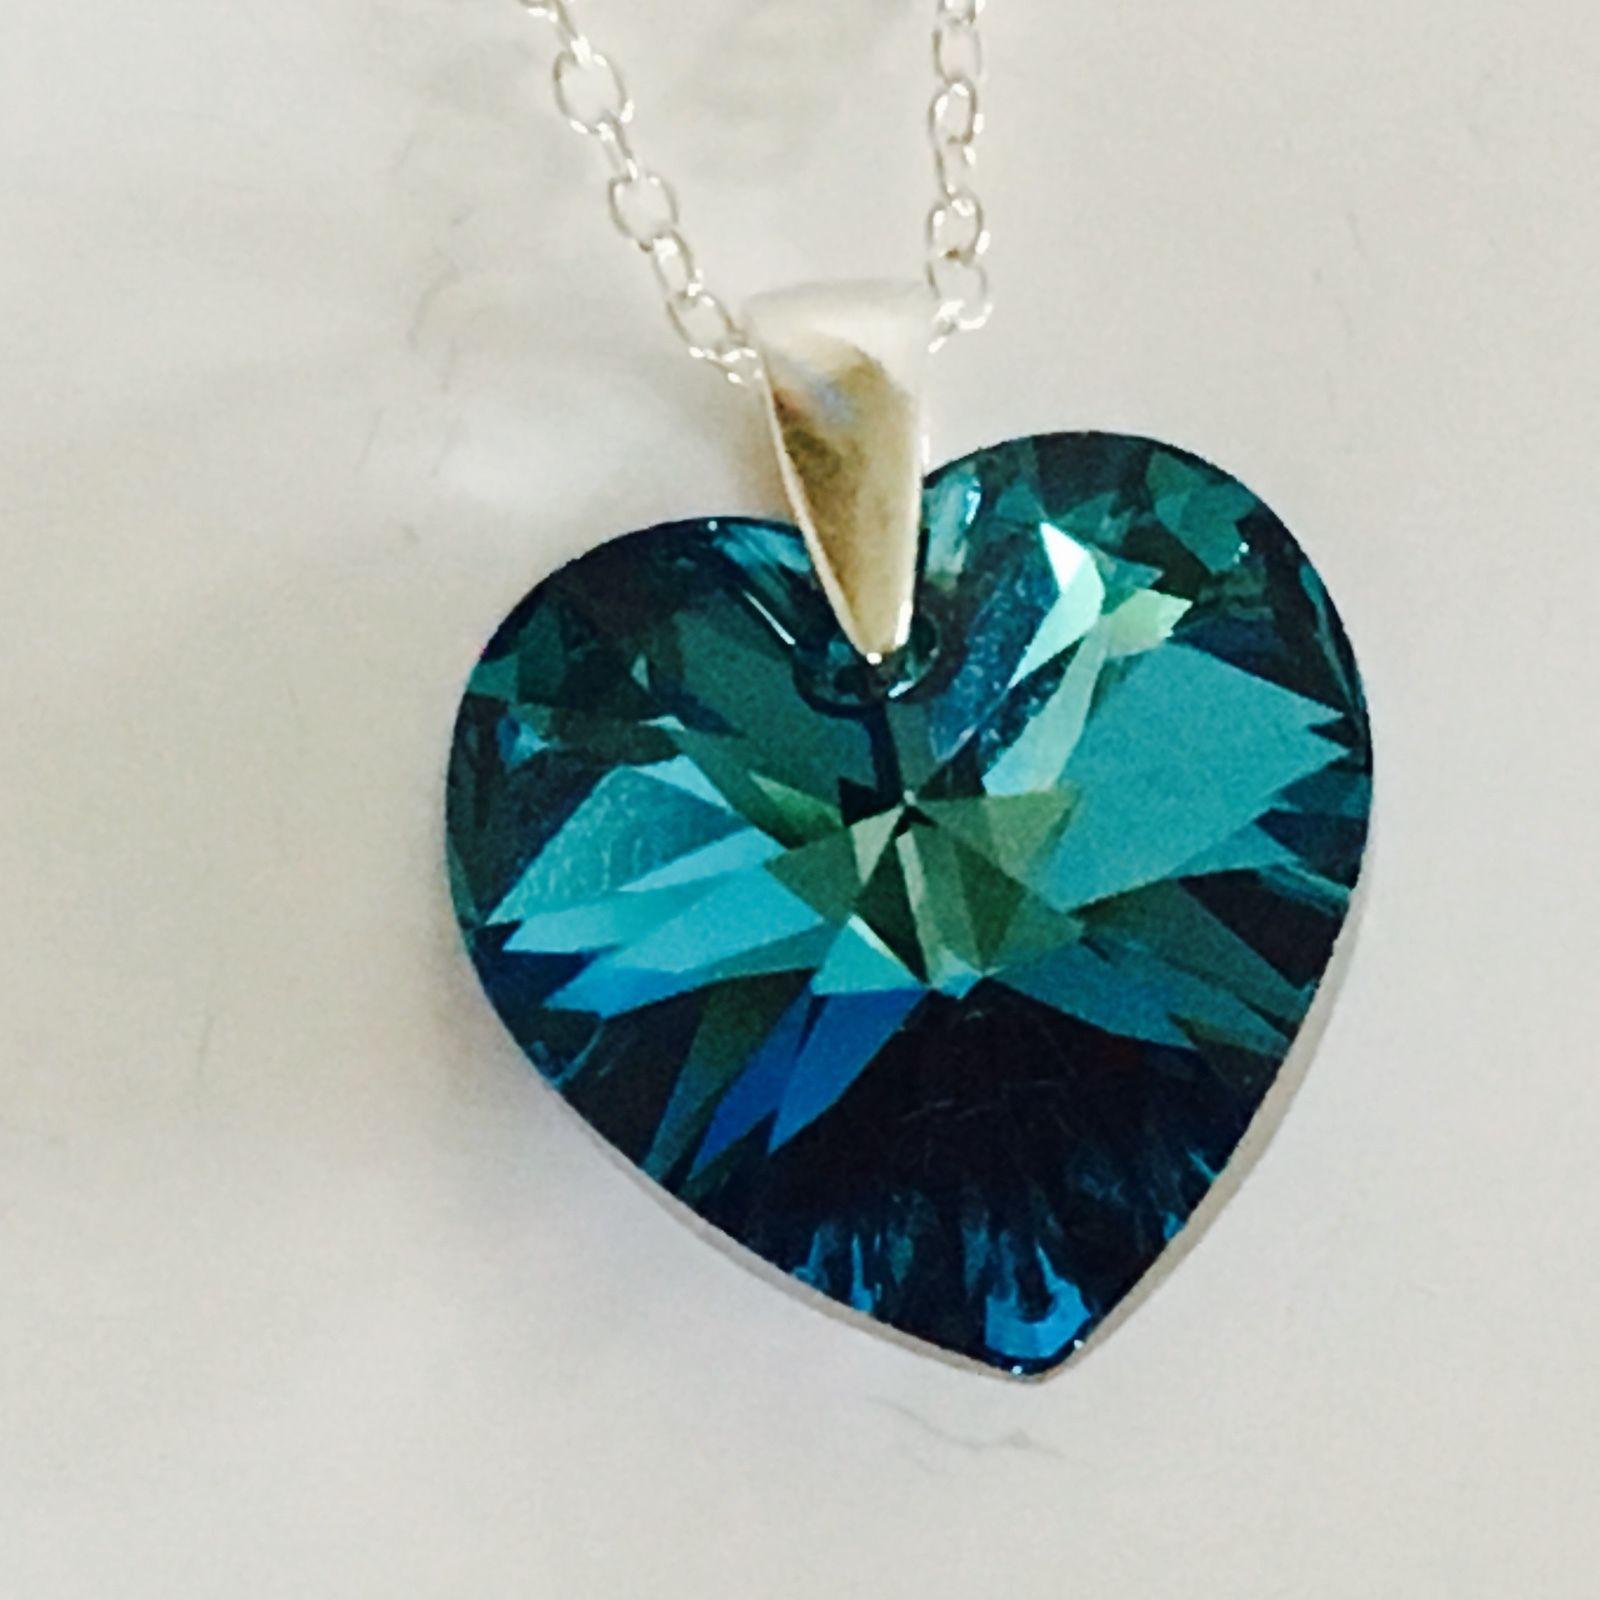 Leaf Pendant Necklace Uk